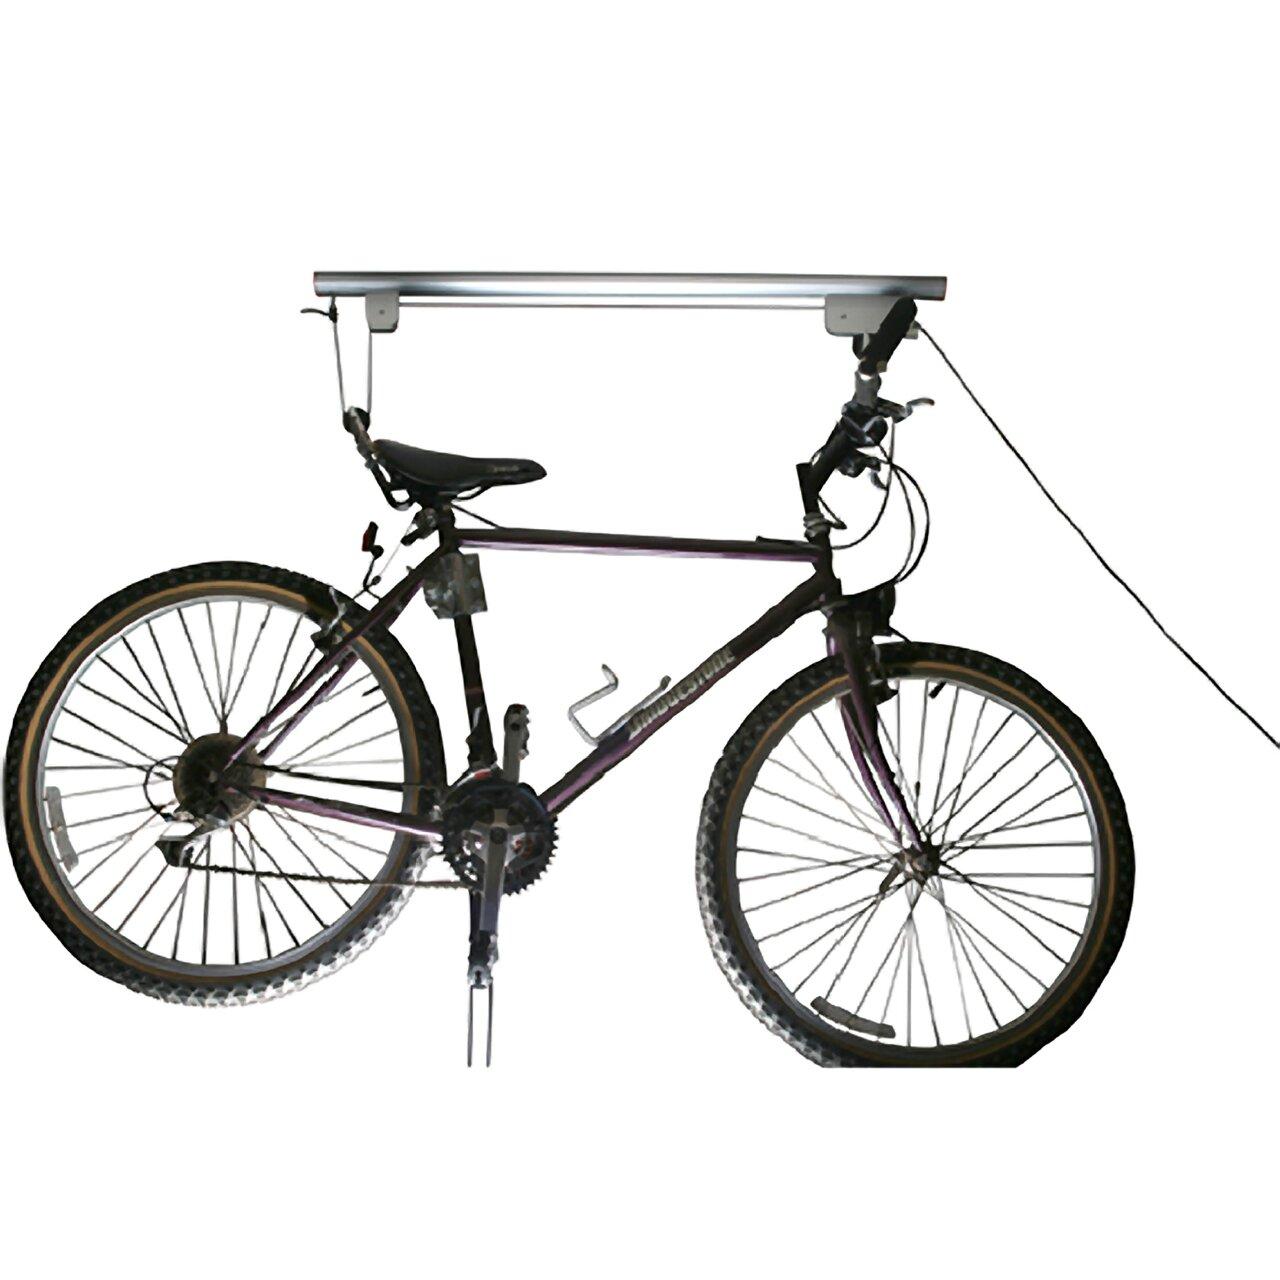 Rad Cycle Products Rail Mount Bike Hoist And Ladder Lift